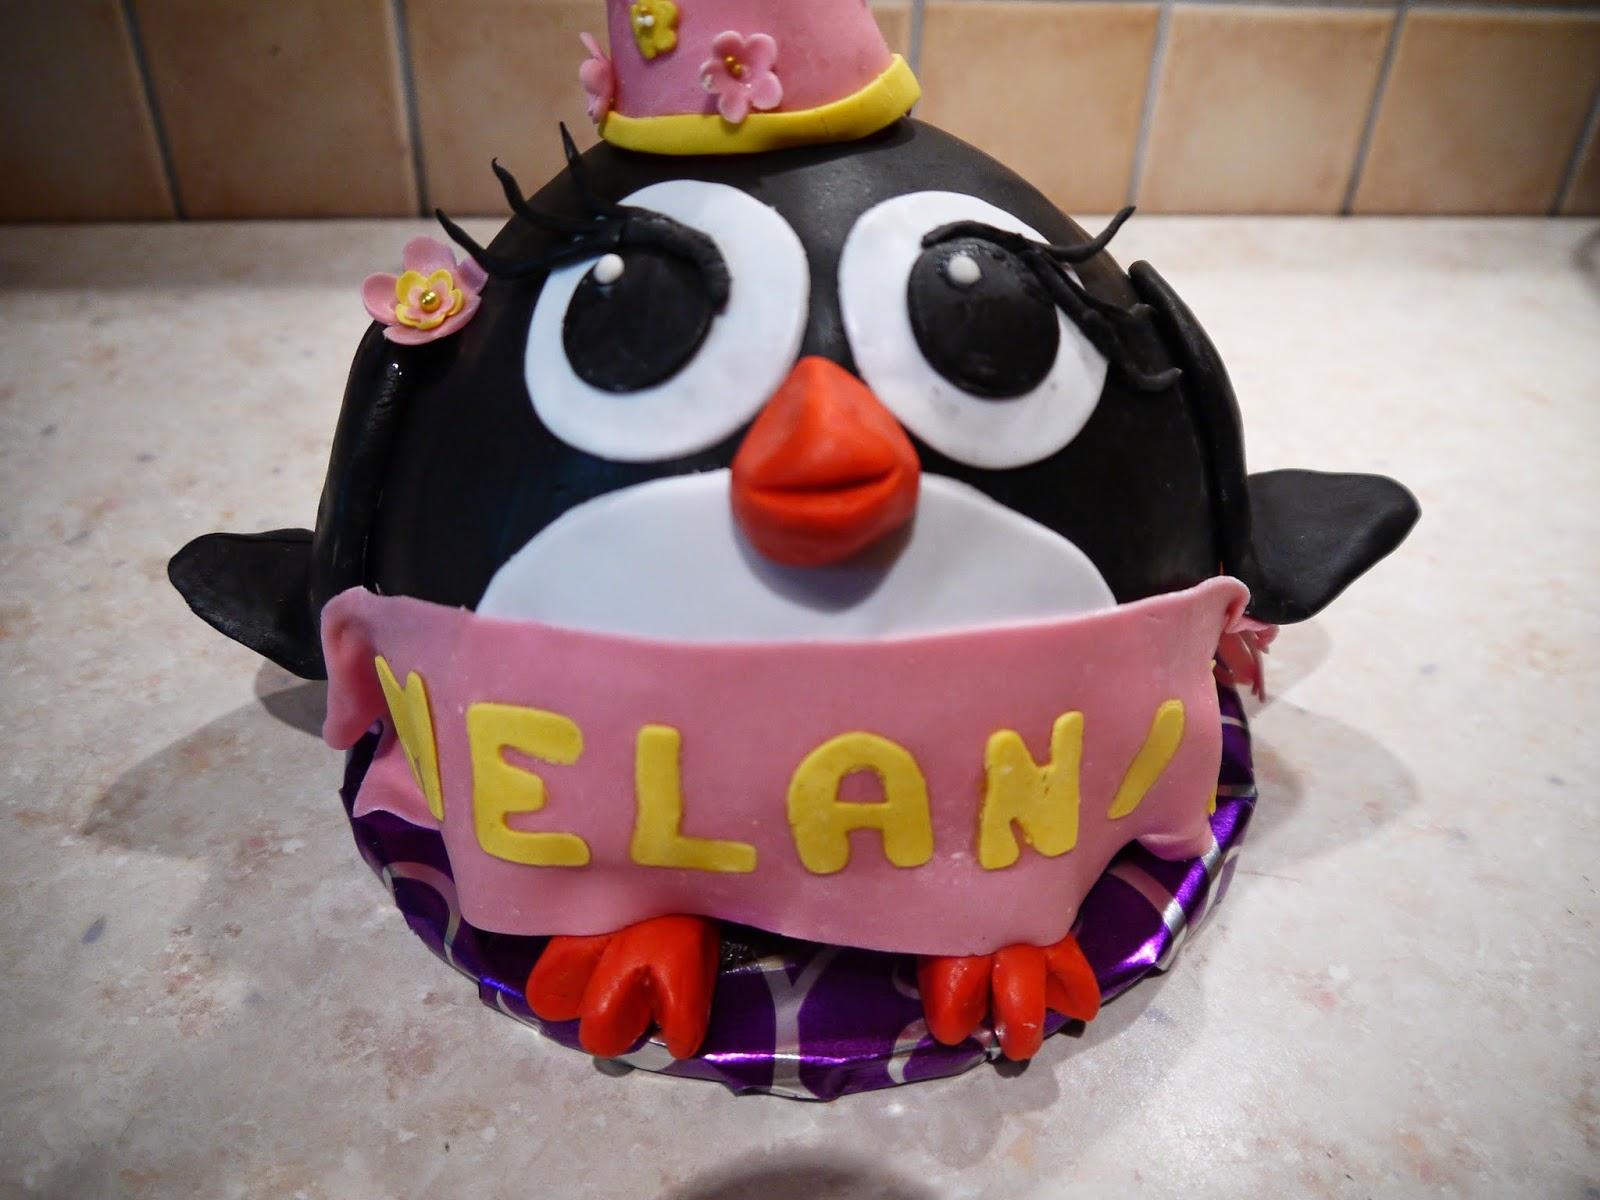 http://msfunnyhome.blogspot.de/2014/05/pinguine-feiern-geburtstag.html